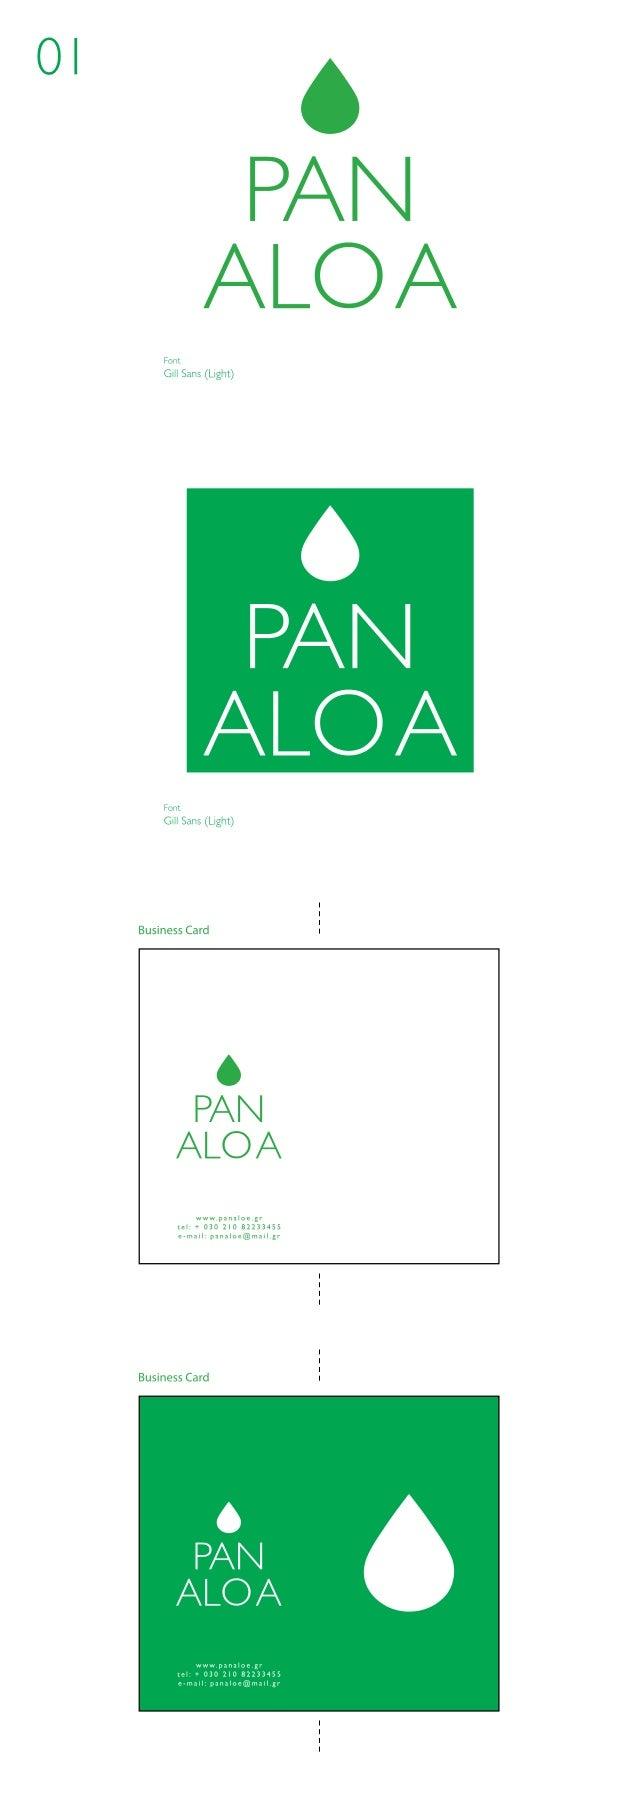 Panaloa - Katerina Miliaraki